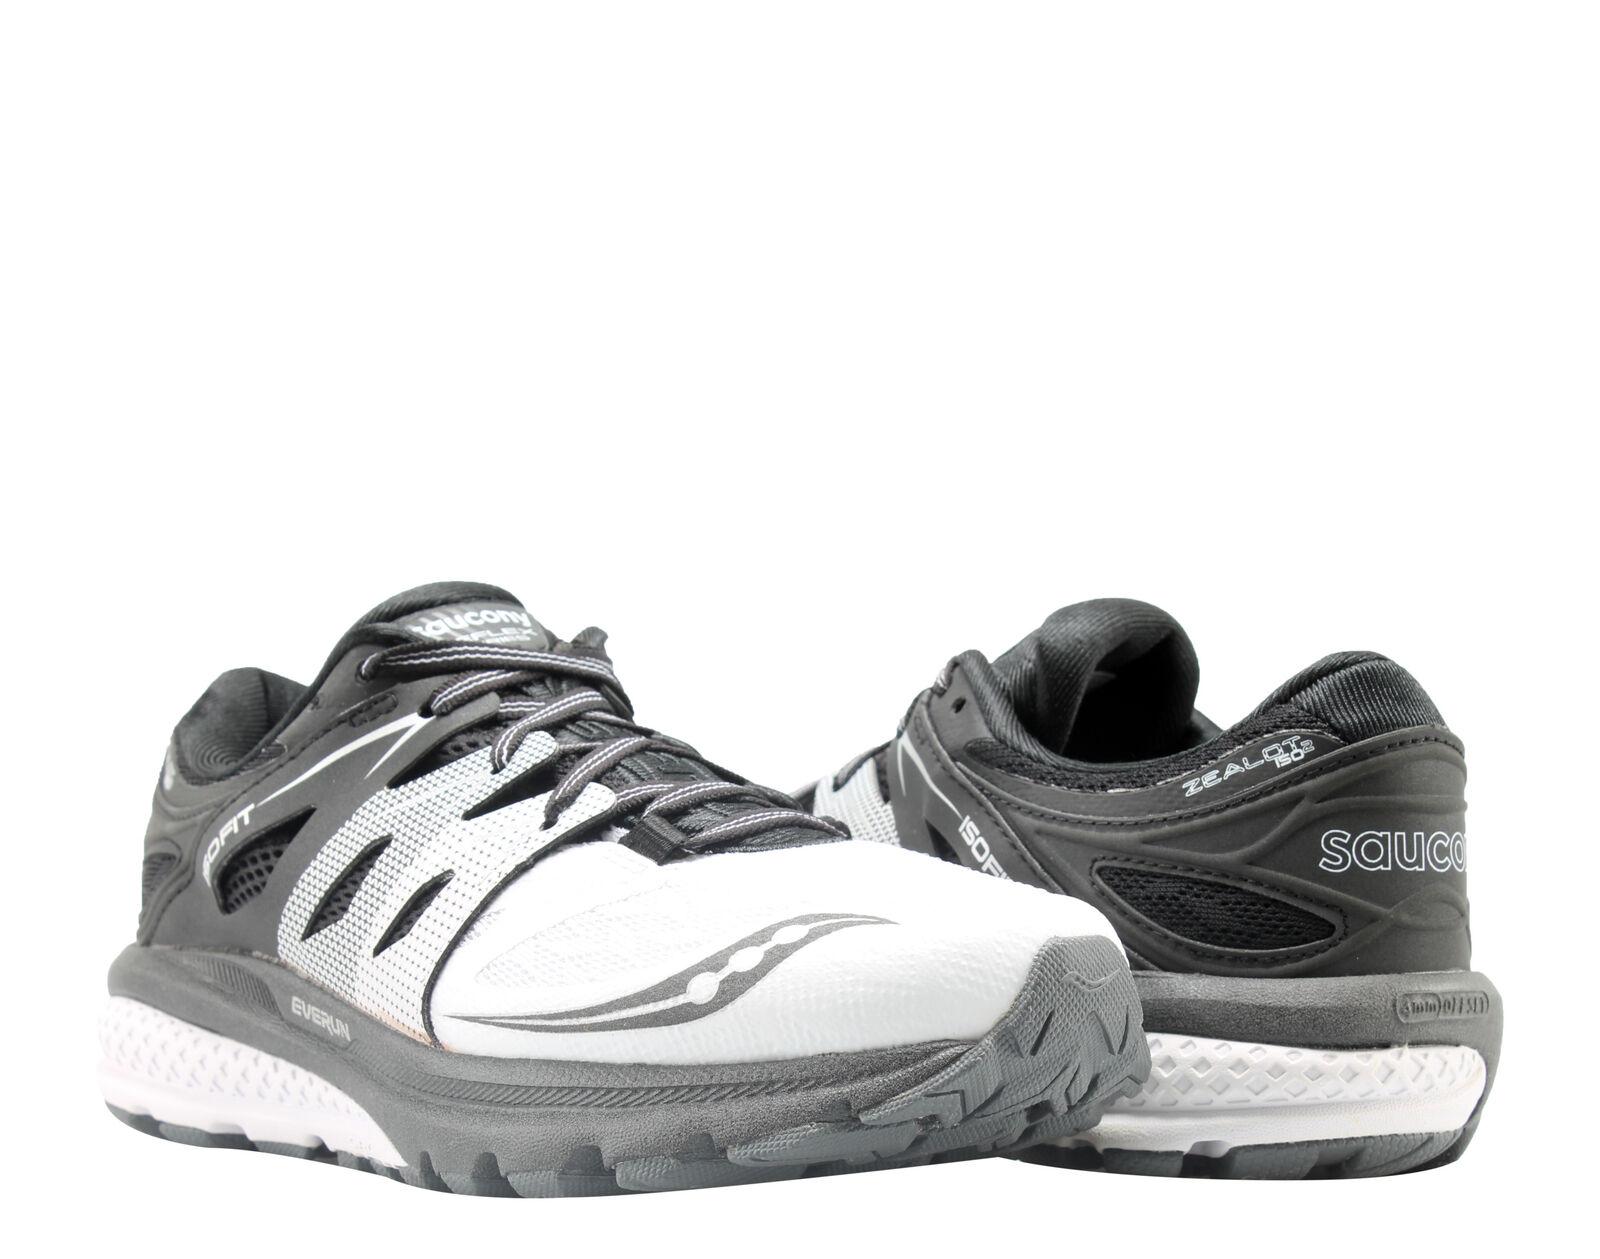 Saucony Zealot ISO 2 Reflex White White White Black Silver Women's Running shoes S10332-1 9ab77d